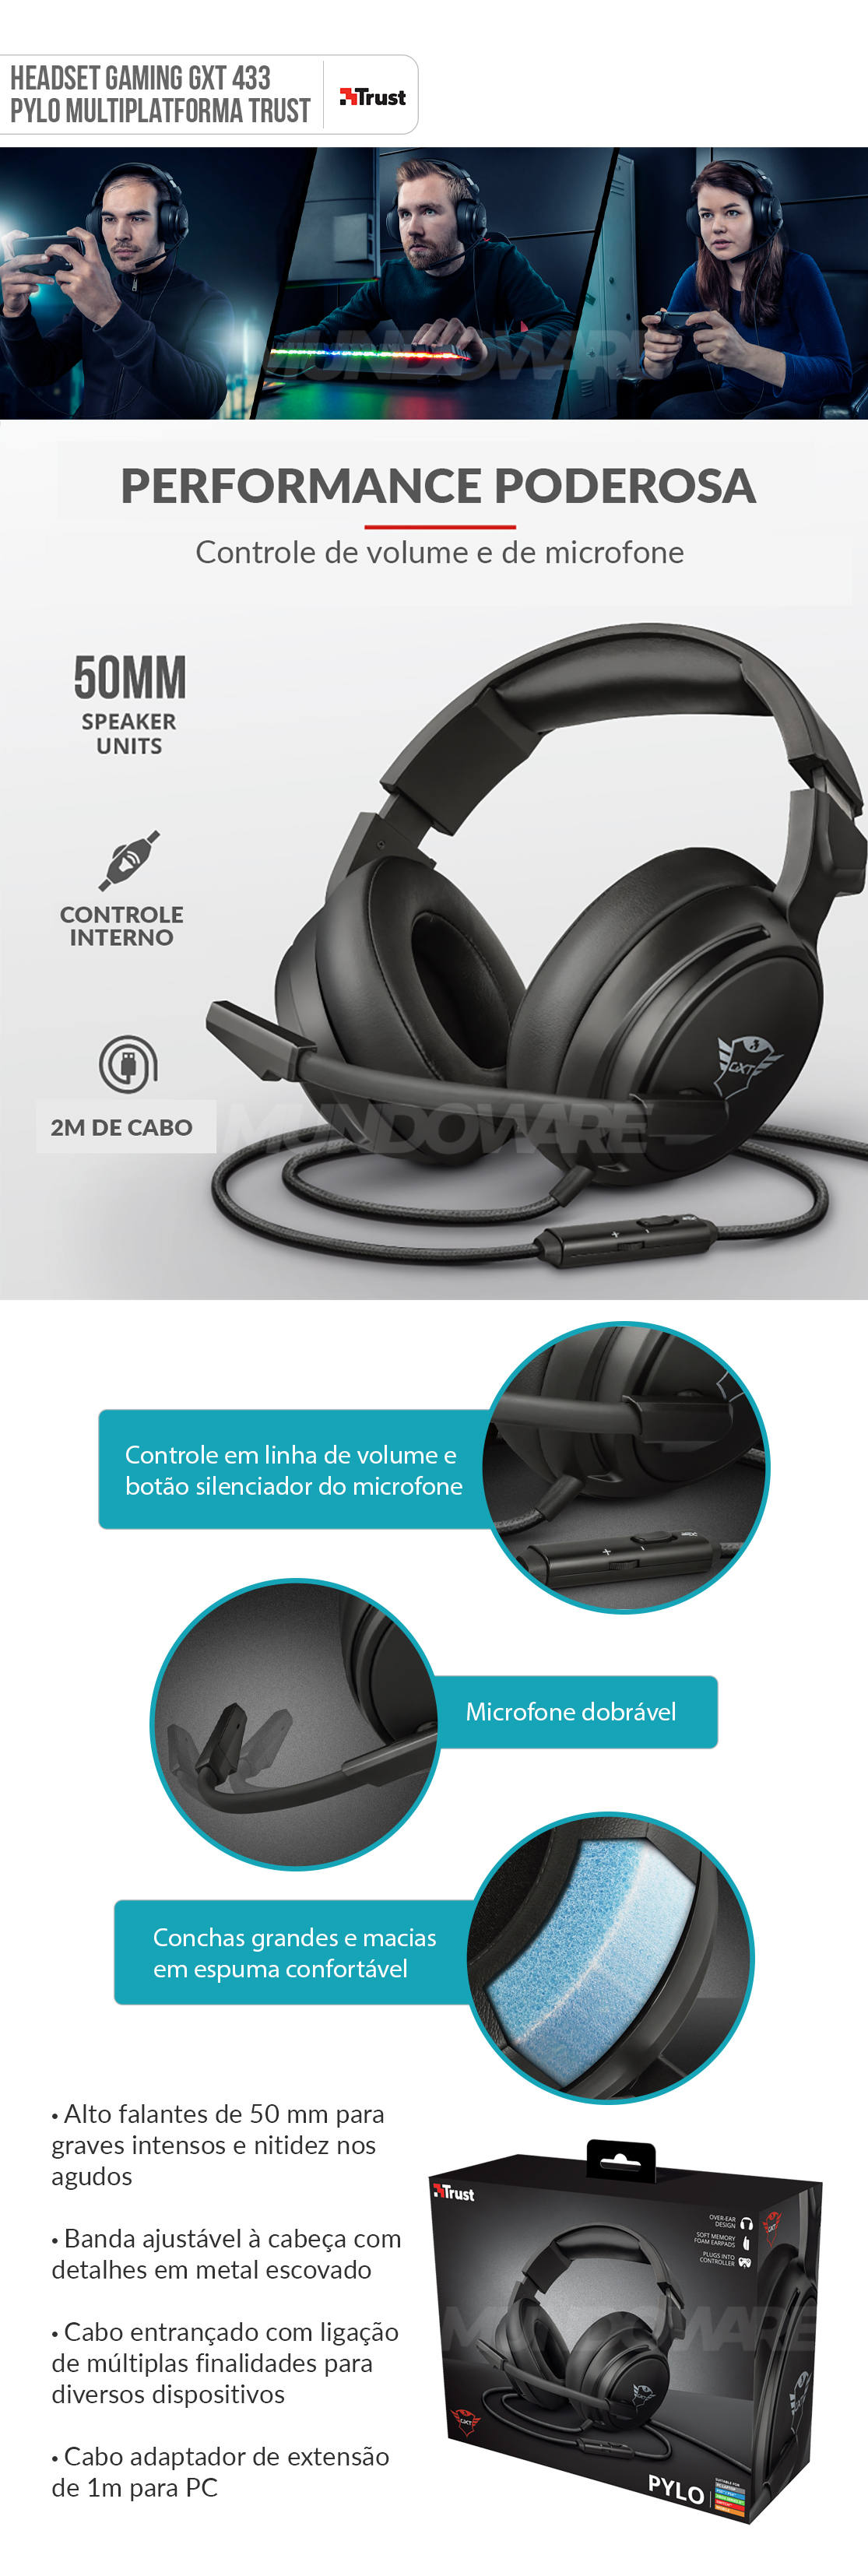 Headset Gamer Multiplatforma Som Potente e Conforto Extremo Trust GXT 433 Pylo Preto